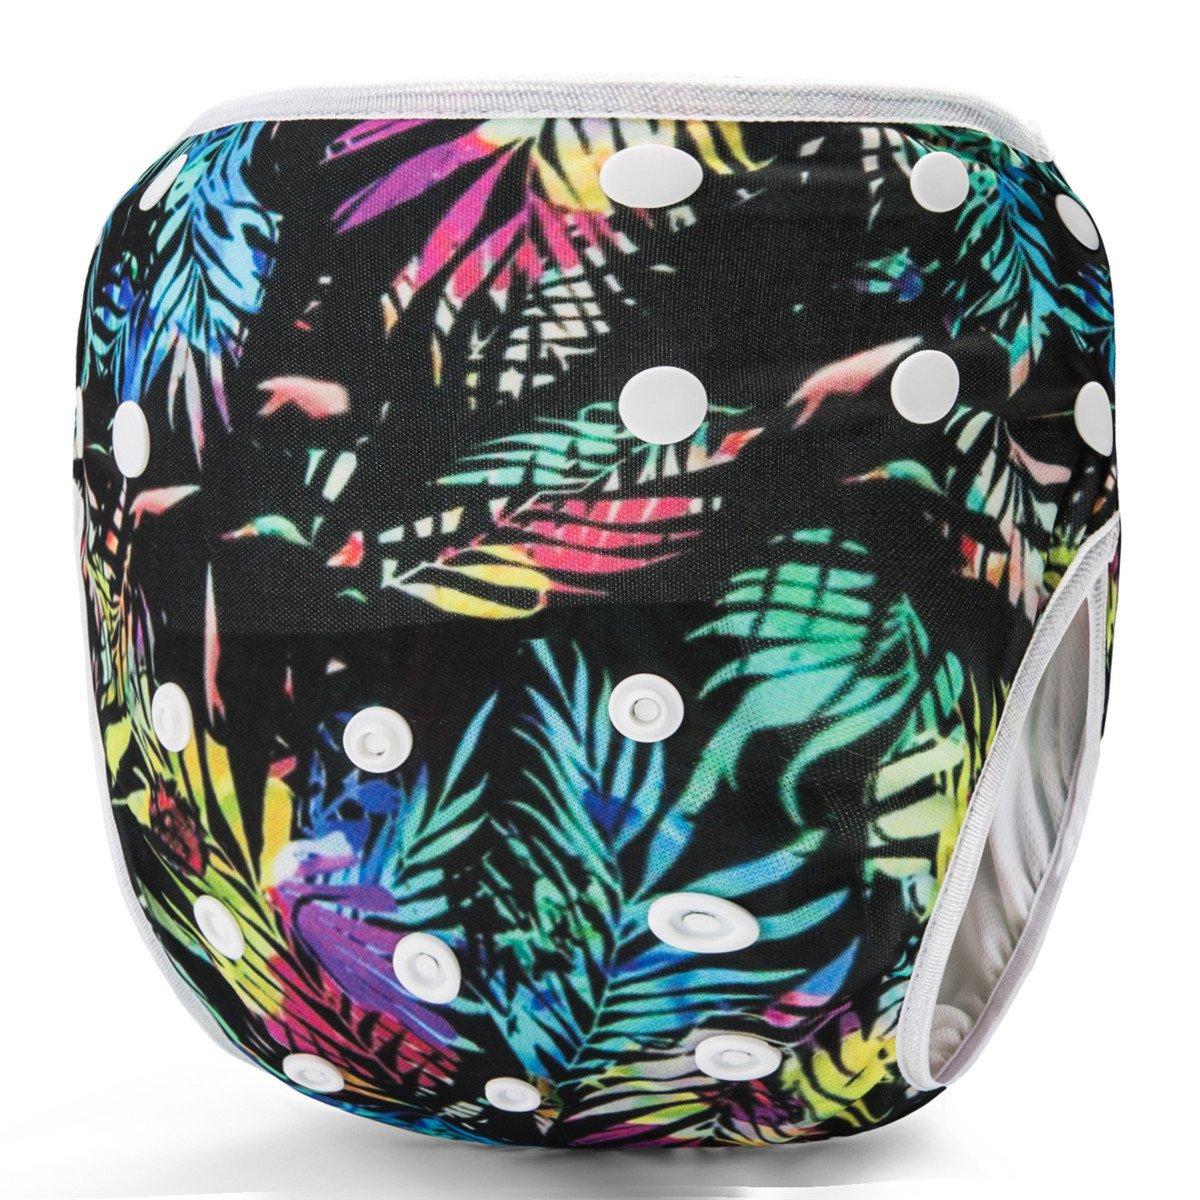 Storeofbaby Reusable Swim Diapers Waterproof Cover Swimming Pants Unisex Baby 0-3 Years